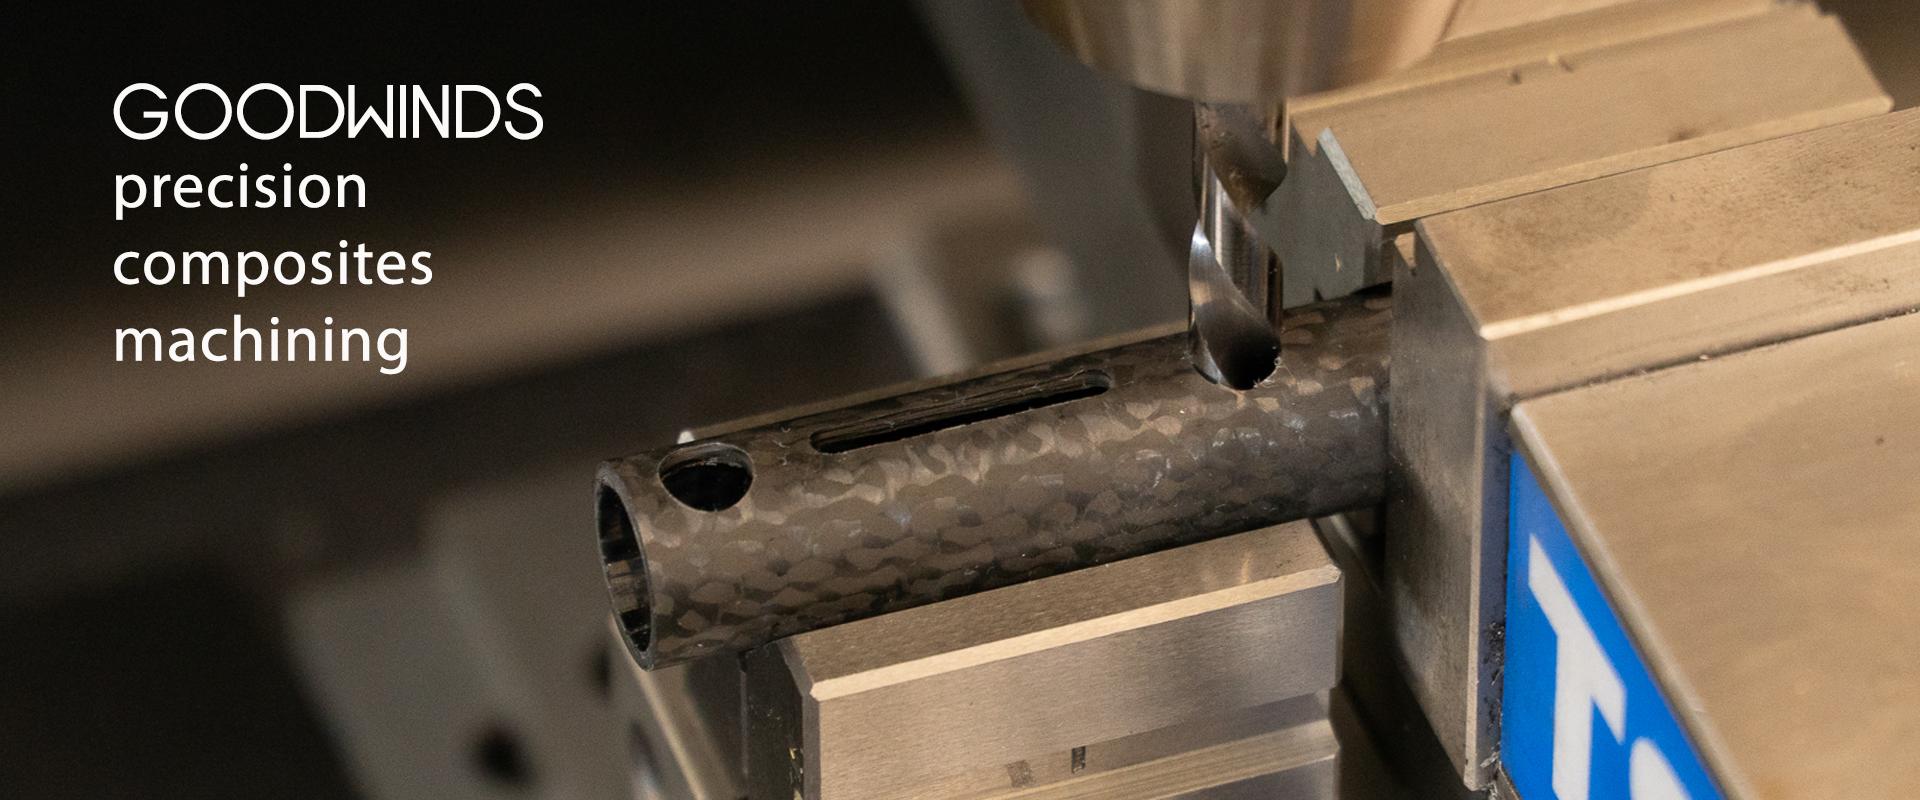 Goodwinds precision composites machining